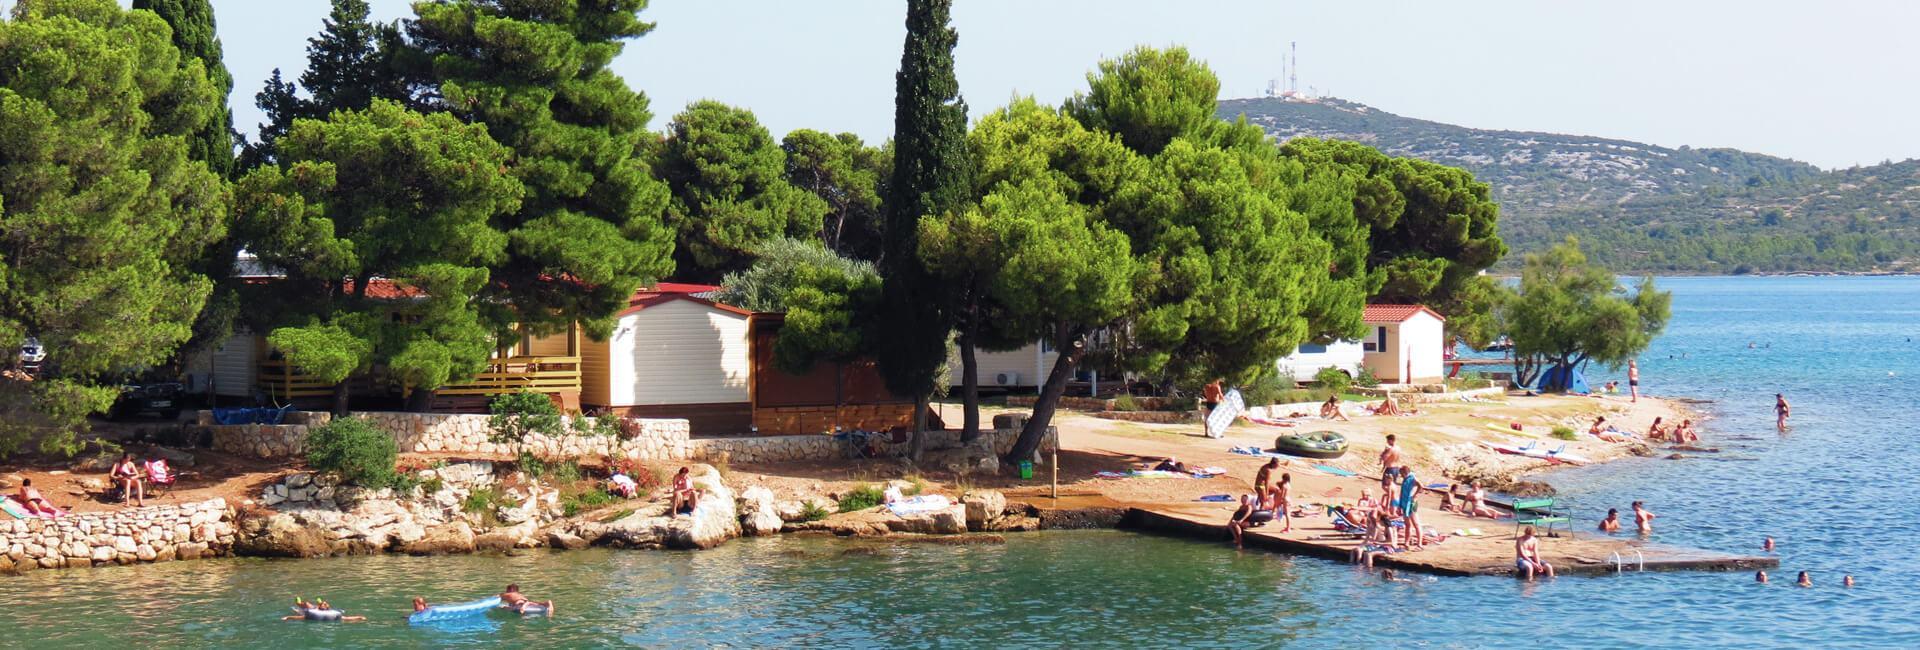 Campingplatz Miran Pirovac Strand